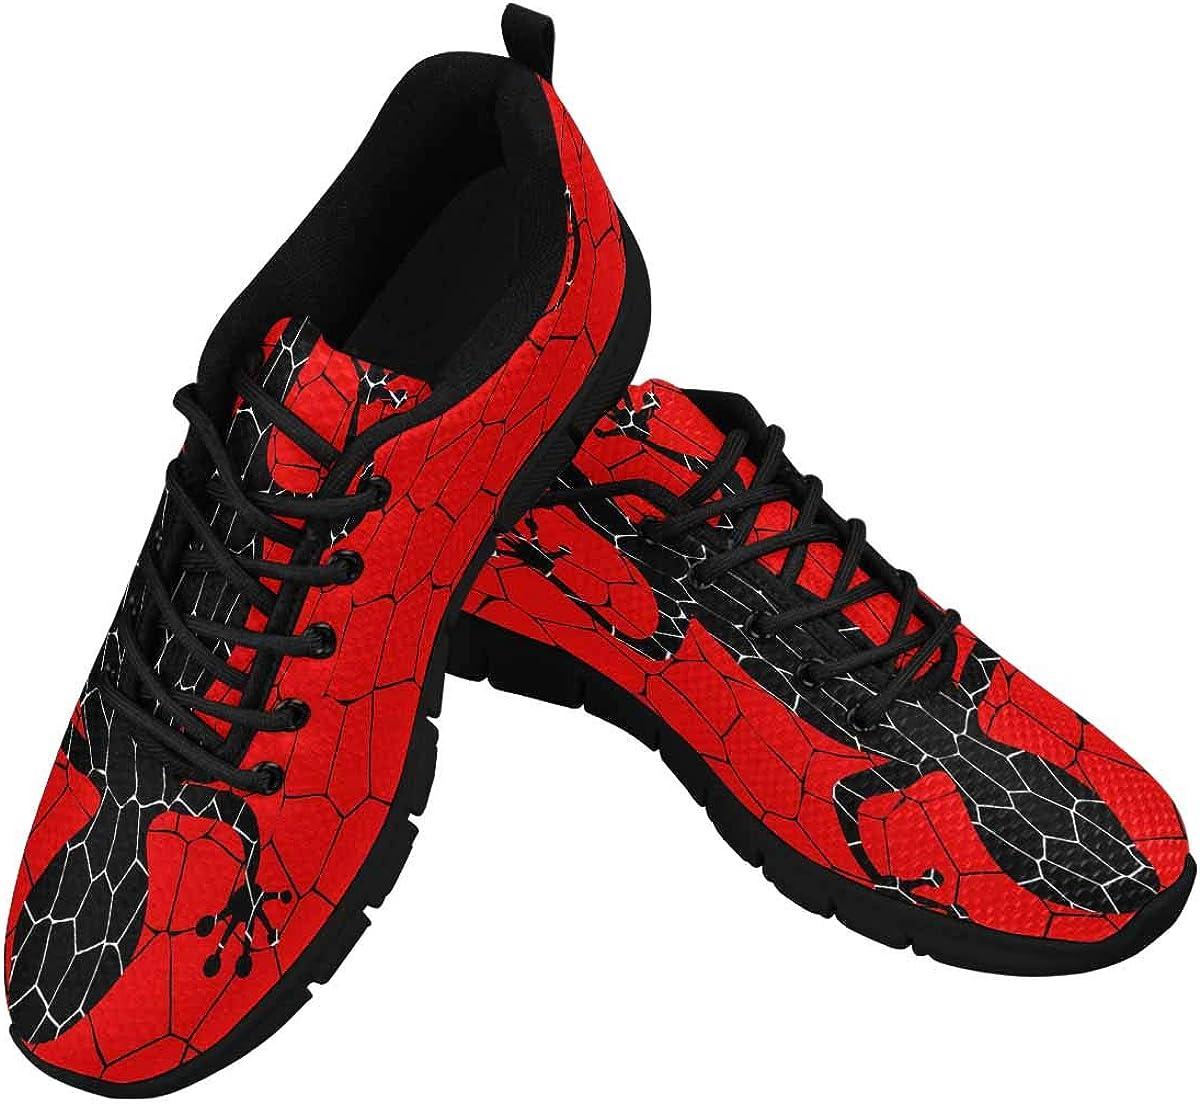 InterestPrint Black Lizards Women's Lightweight Athletic Casual Gym Sneakers